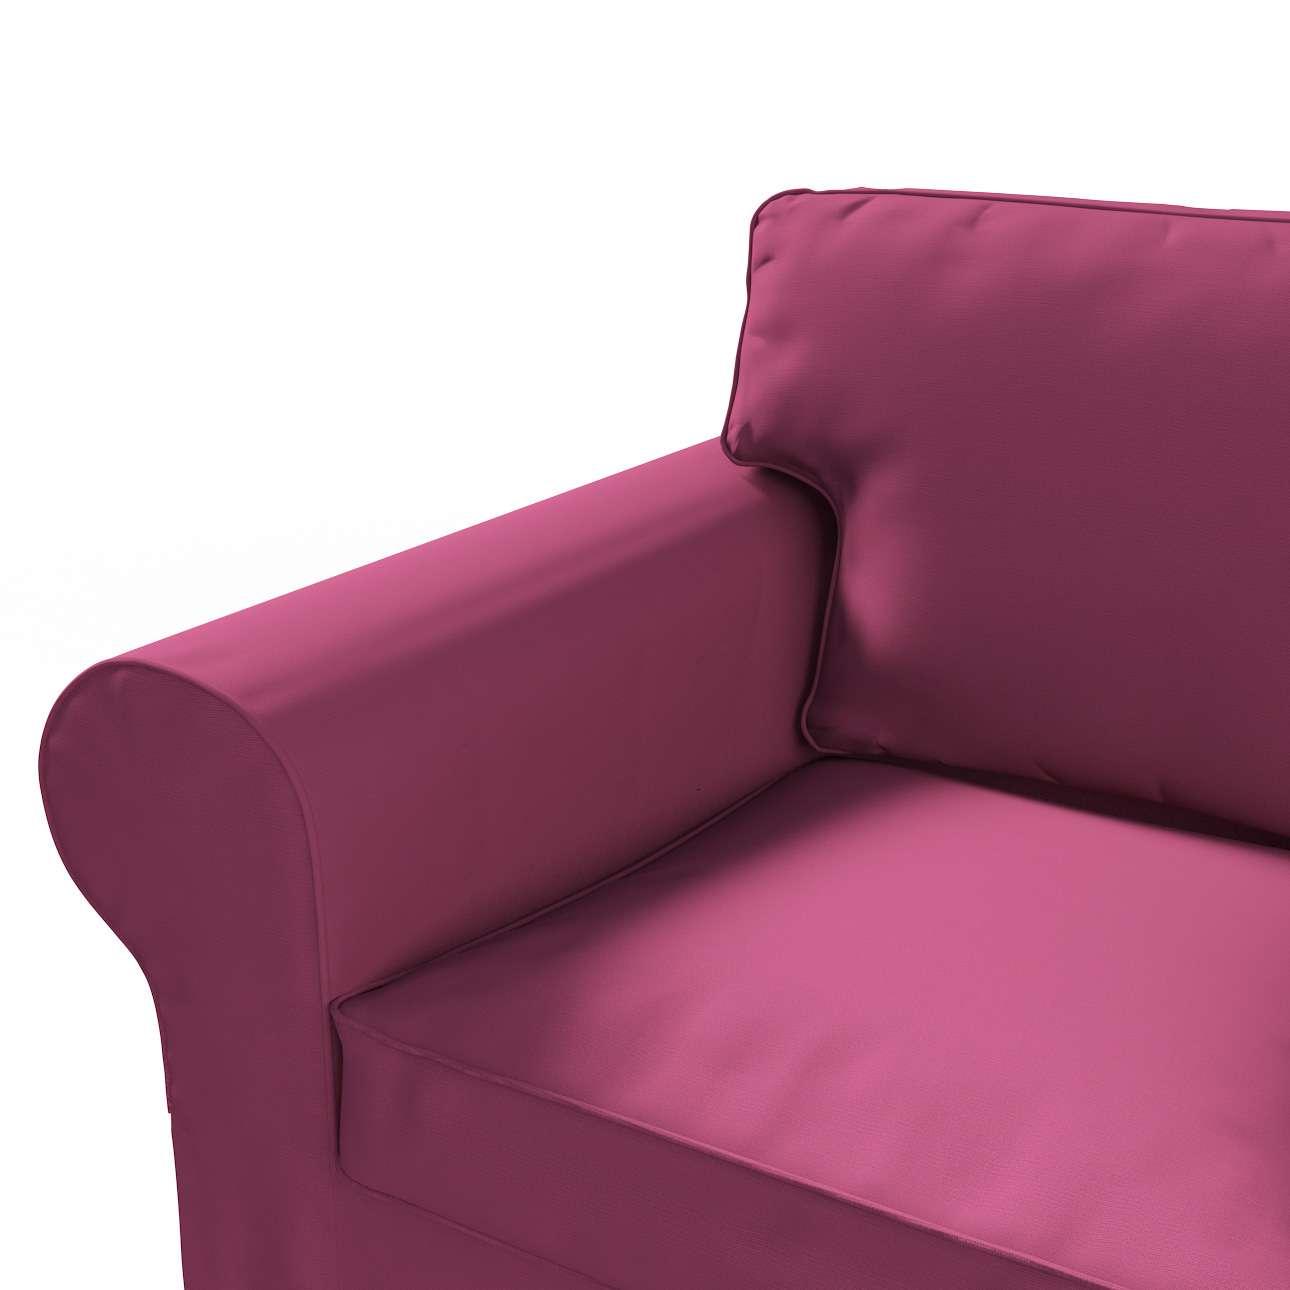 Ektorp 2-Sitzer Schlafsofabezug ALTES Modell Sofabezug Ektorp 2-Sitzer Schlafsofa altes Modell von der Kollektion Cotton Panama, Stoff: 702-32